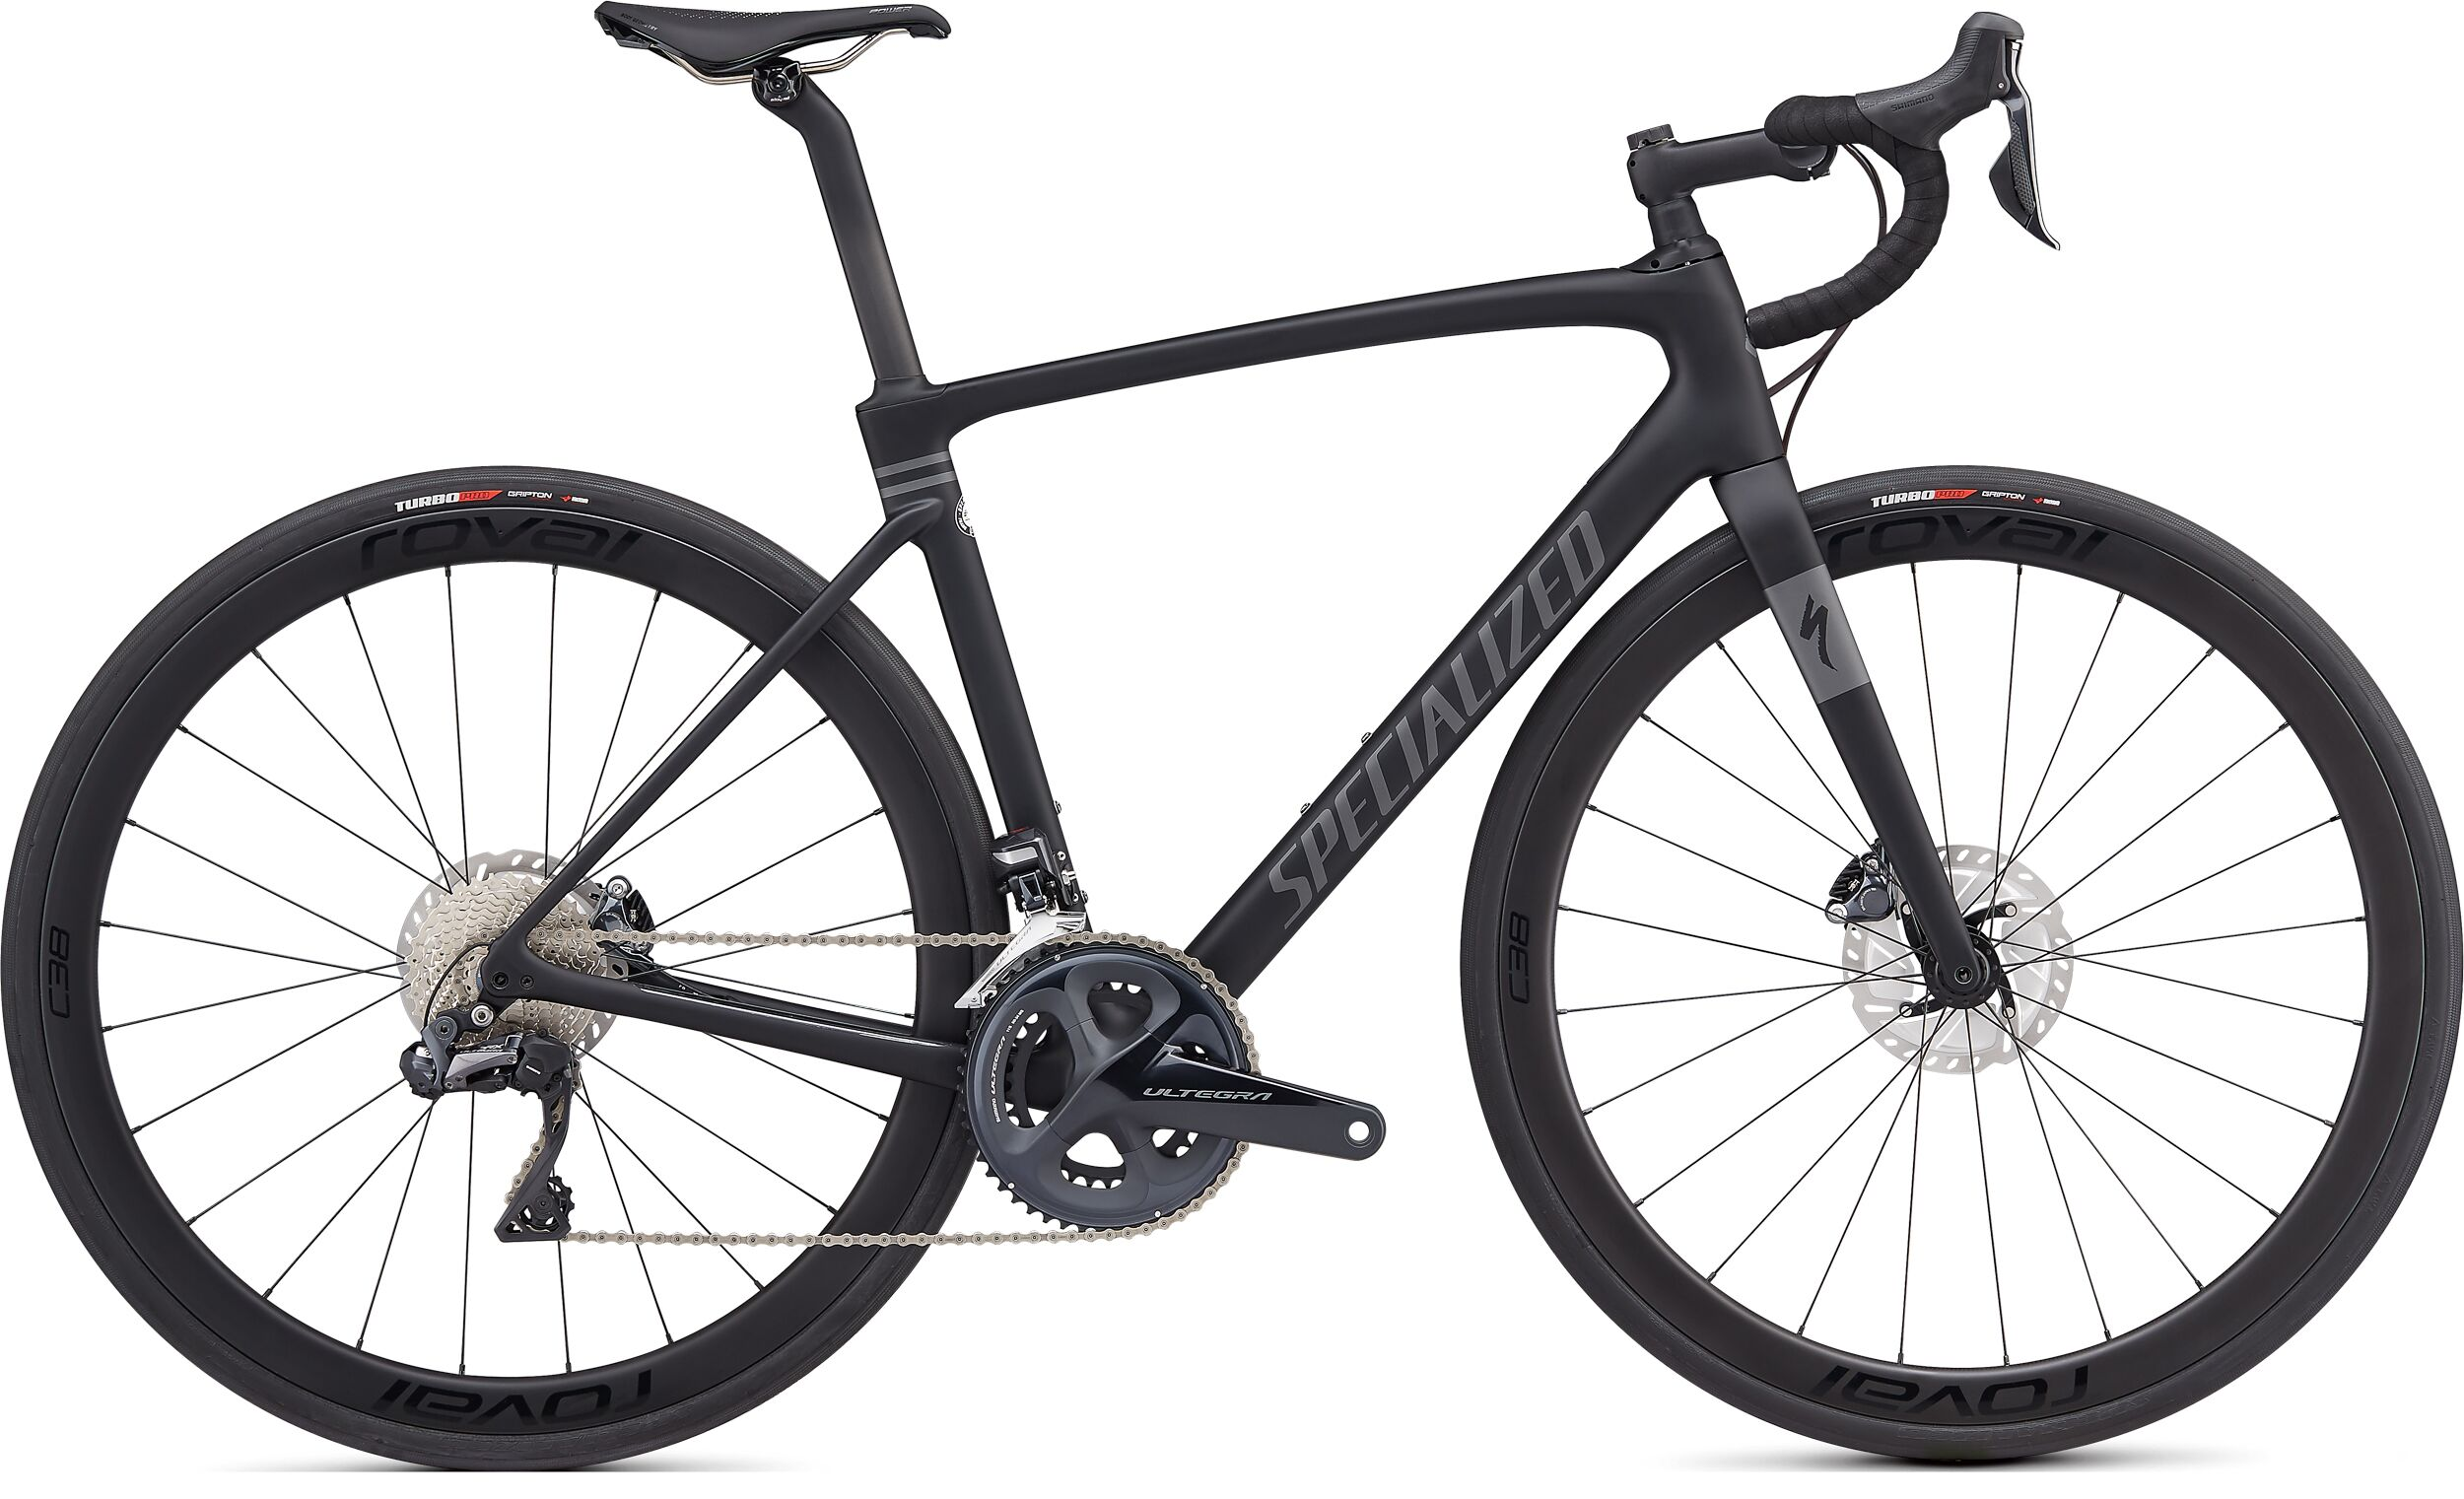 Specialized Roubaix Expert Road Bike 2020 Satin Black